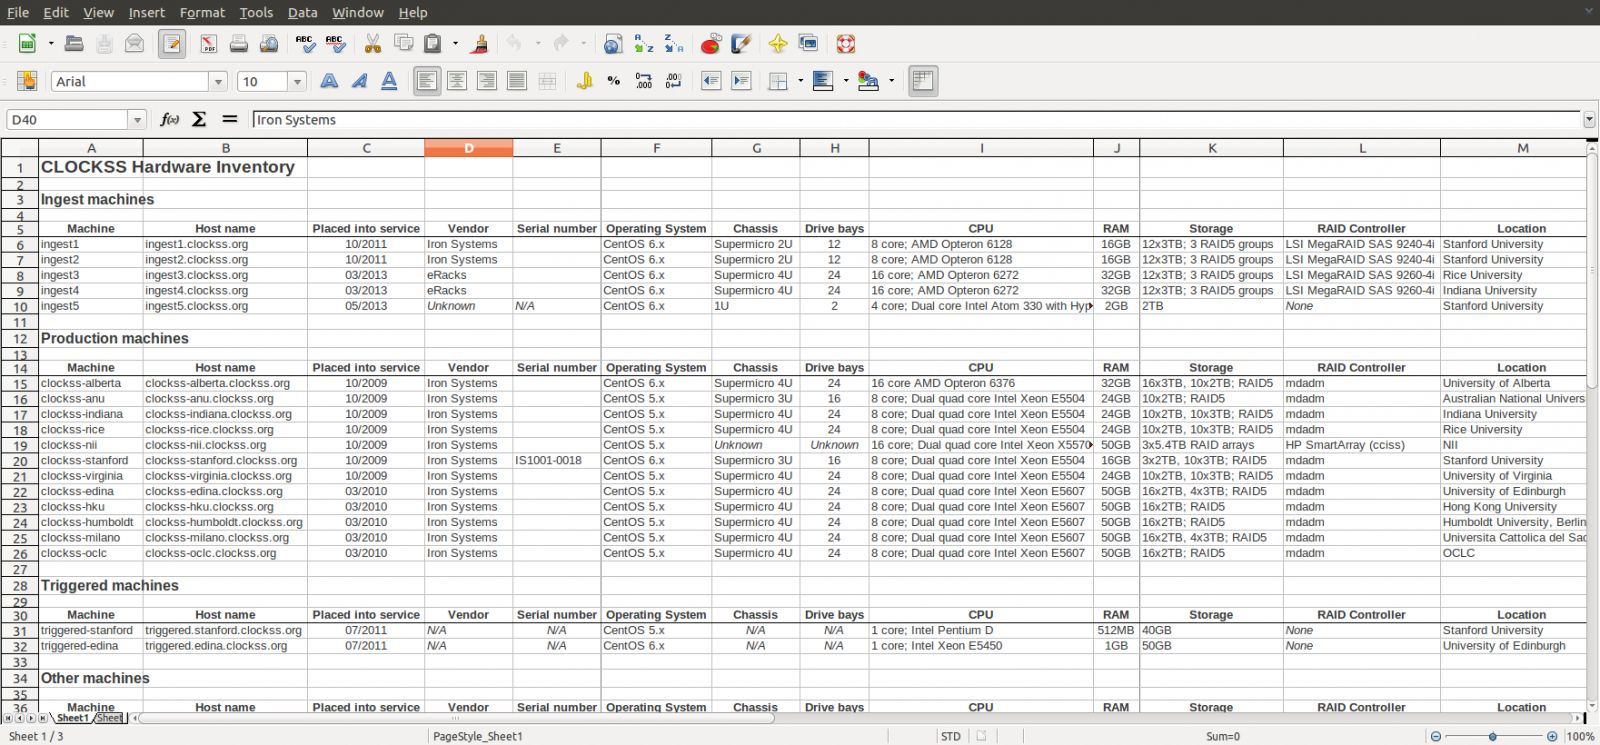 Ammunition Inventory Spreadsheet Pertaining To Stock Inventory Spreadsheet .stock Inventory Spreadsheet